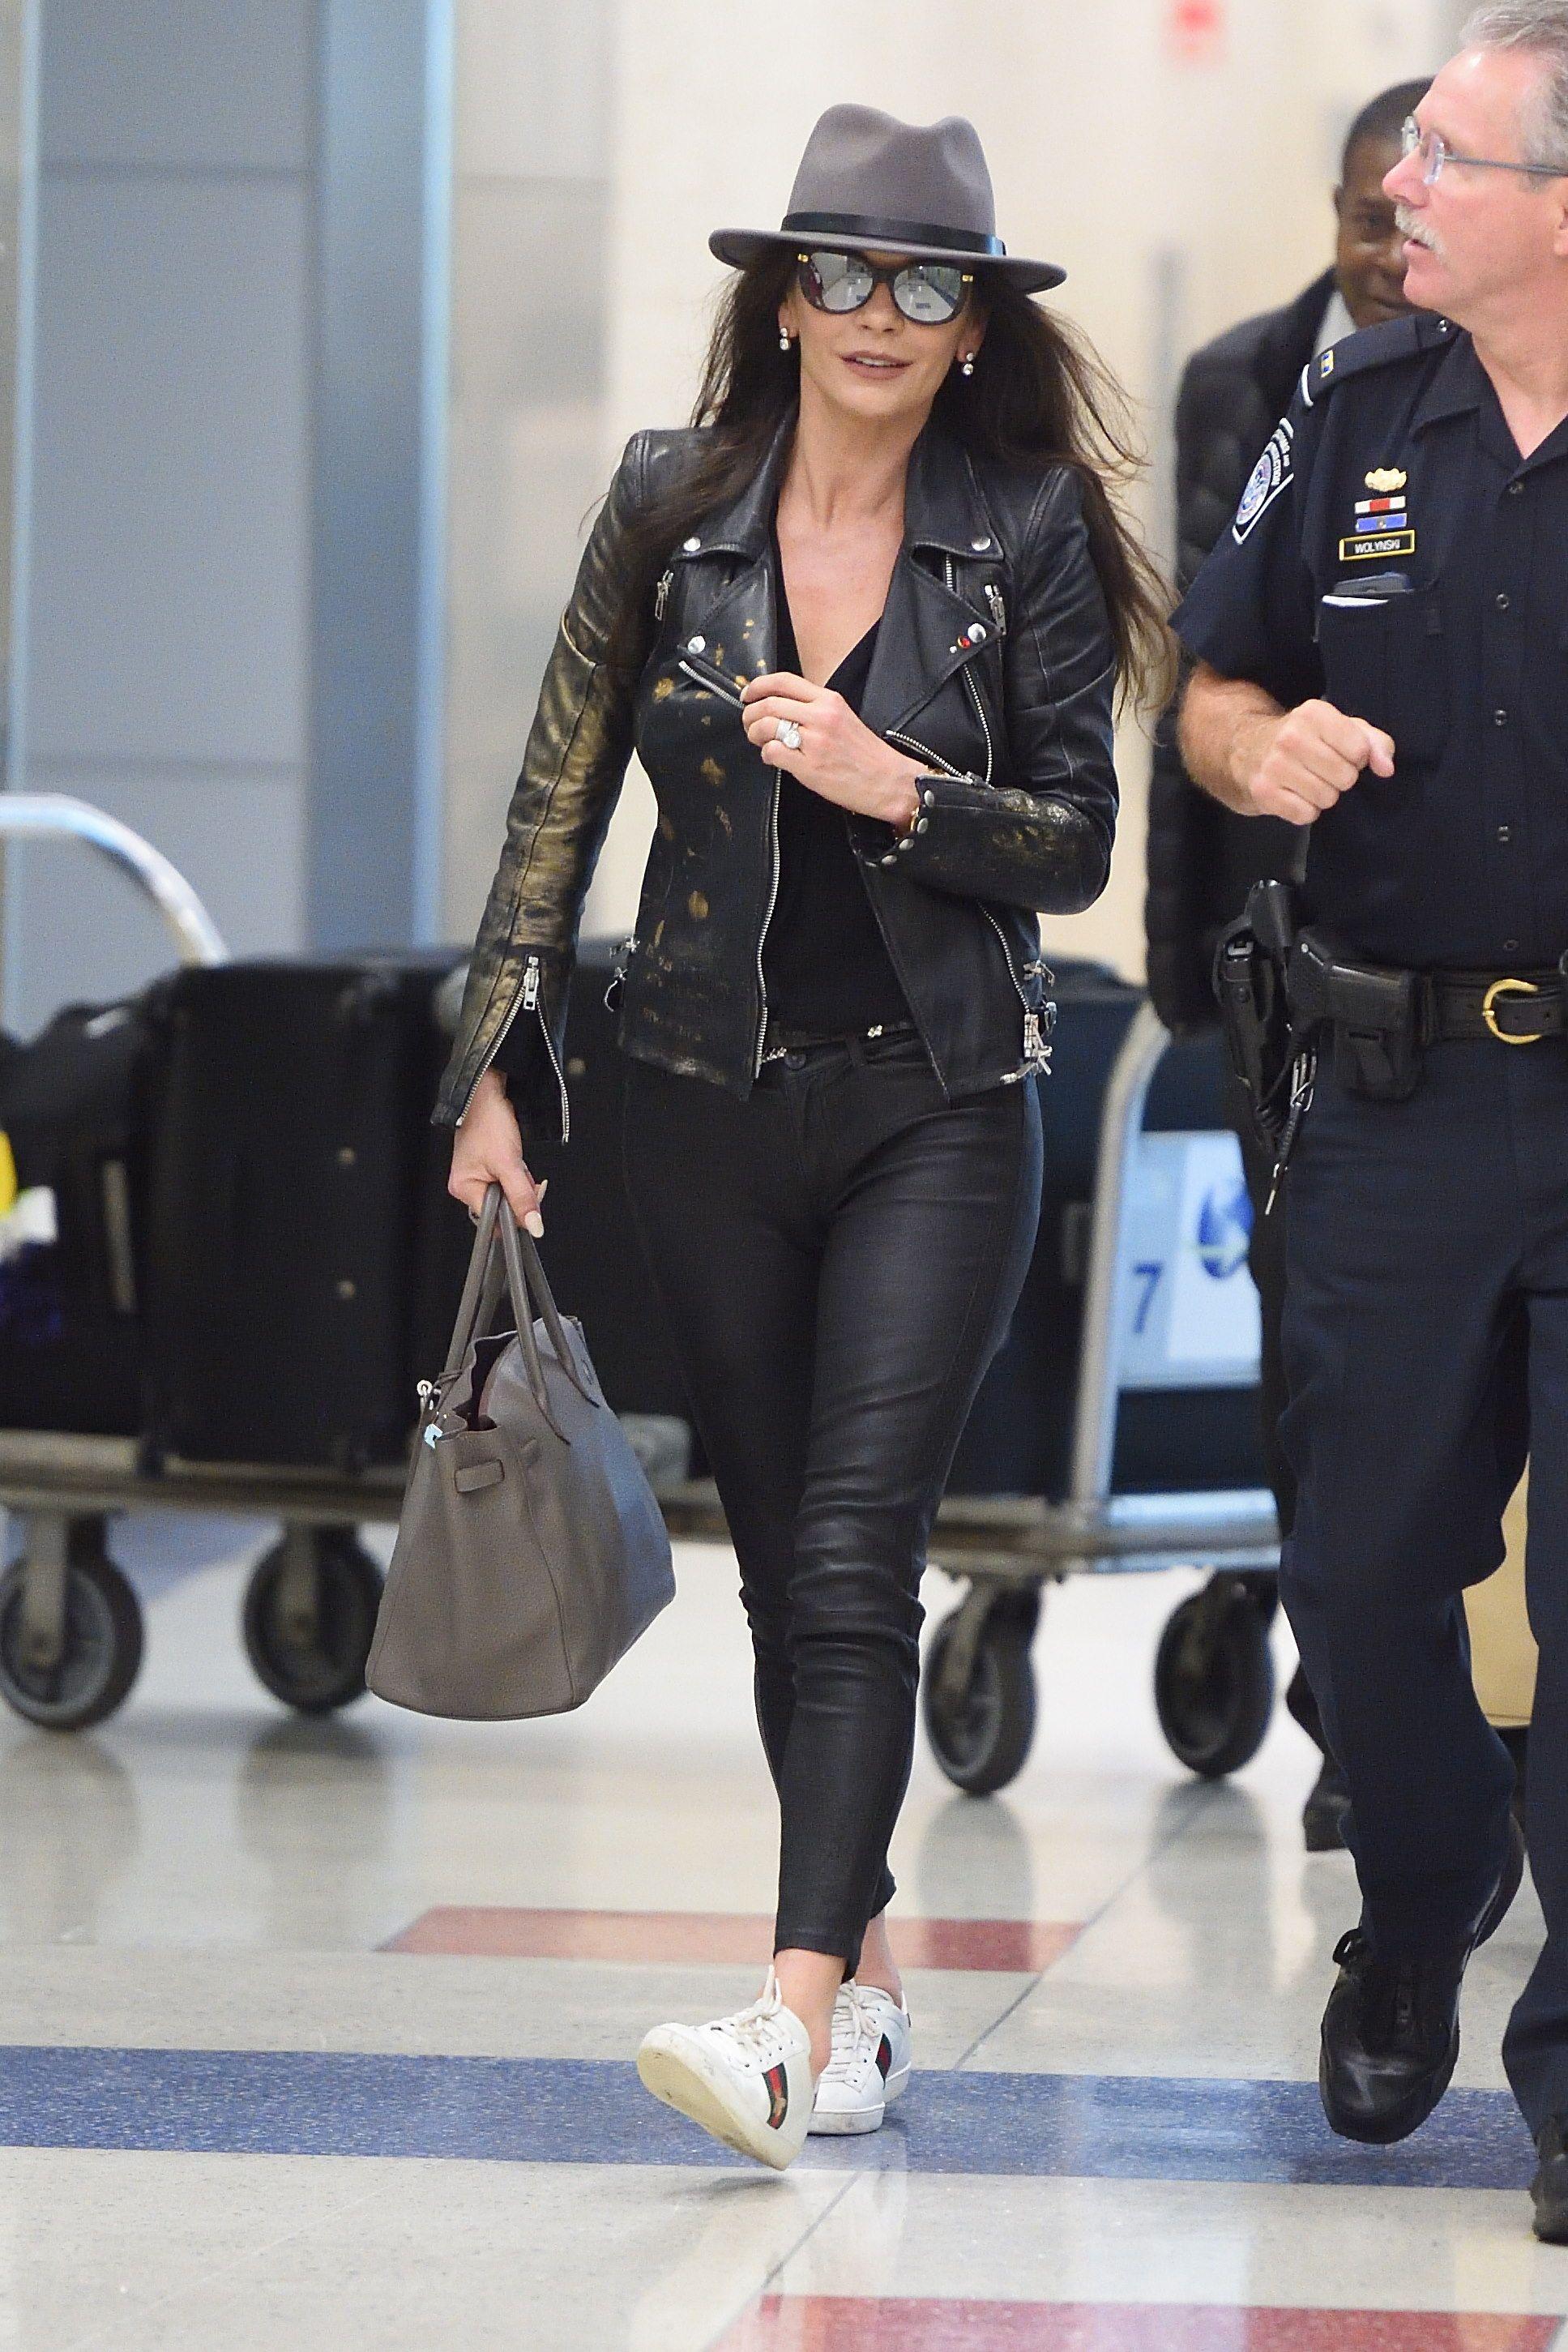 Catherine Zeta-Jones seen at JFK airport